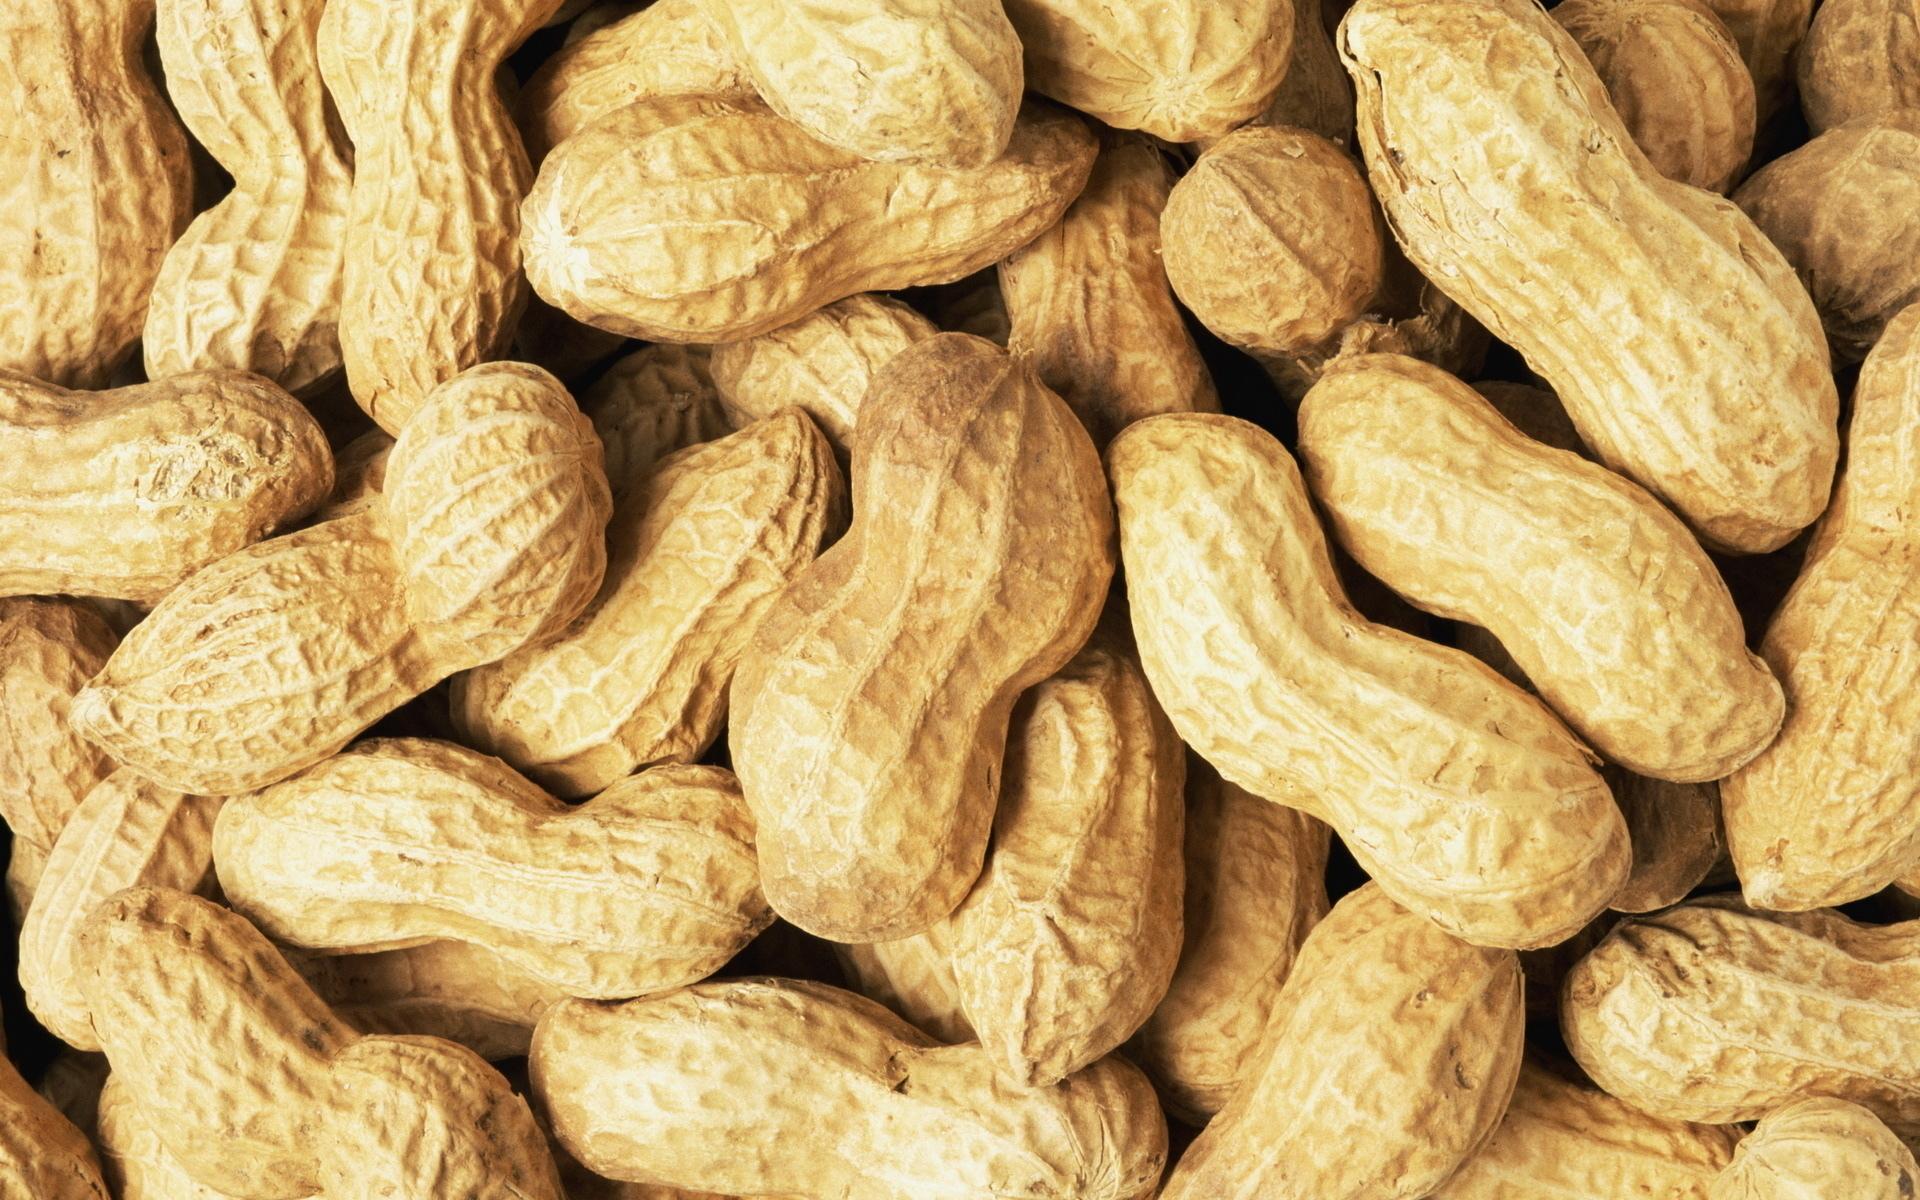 Peanut wallpapers HD quality